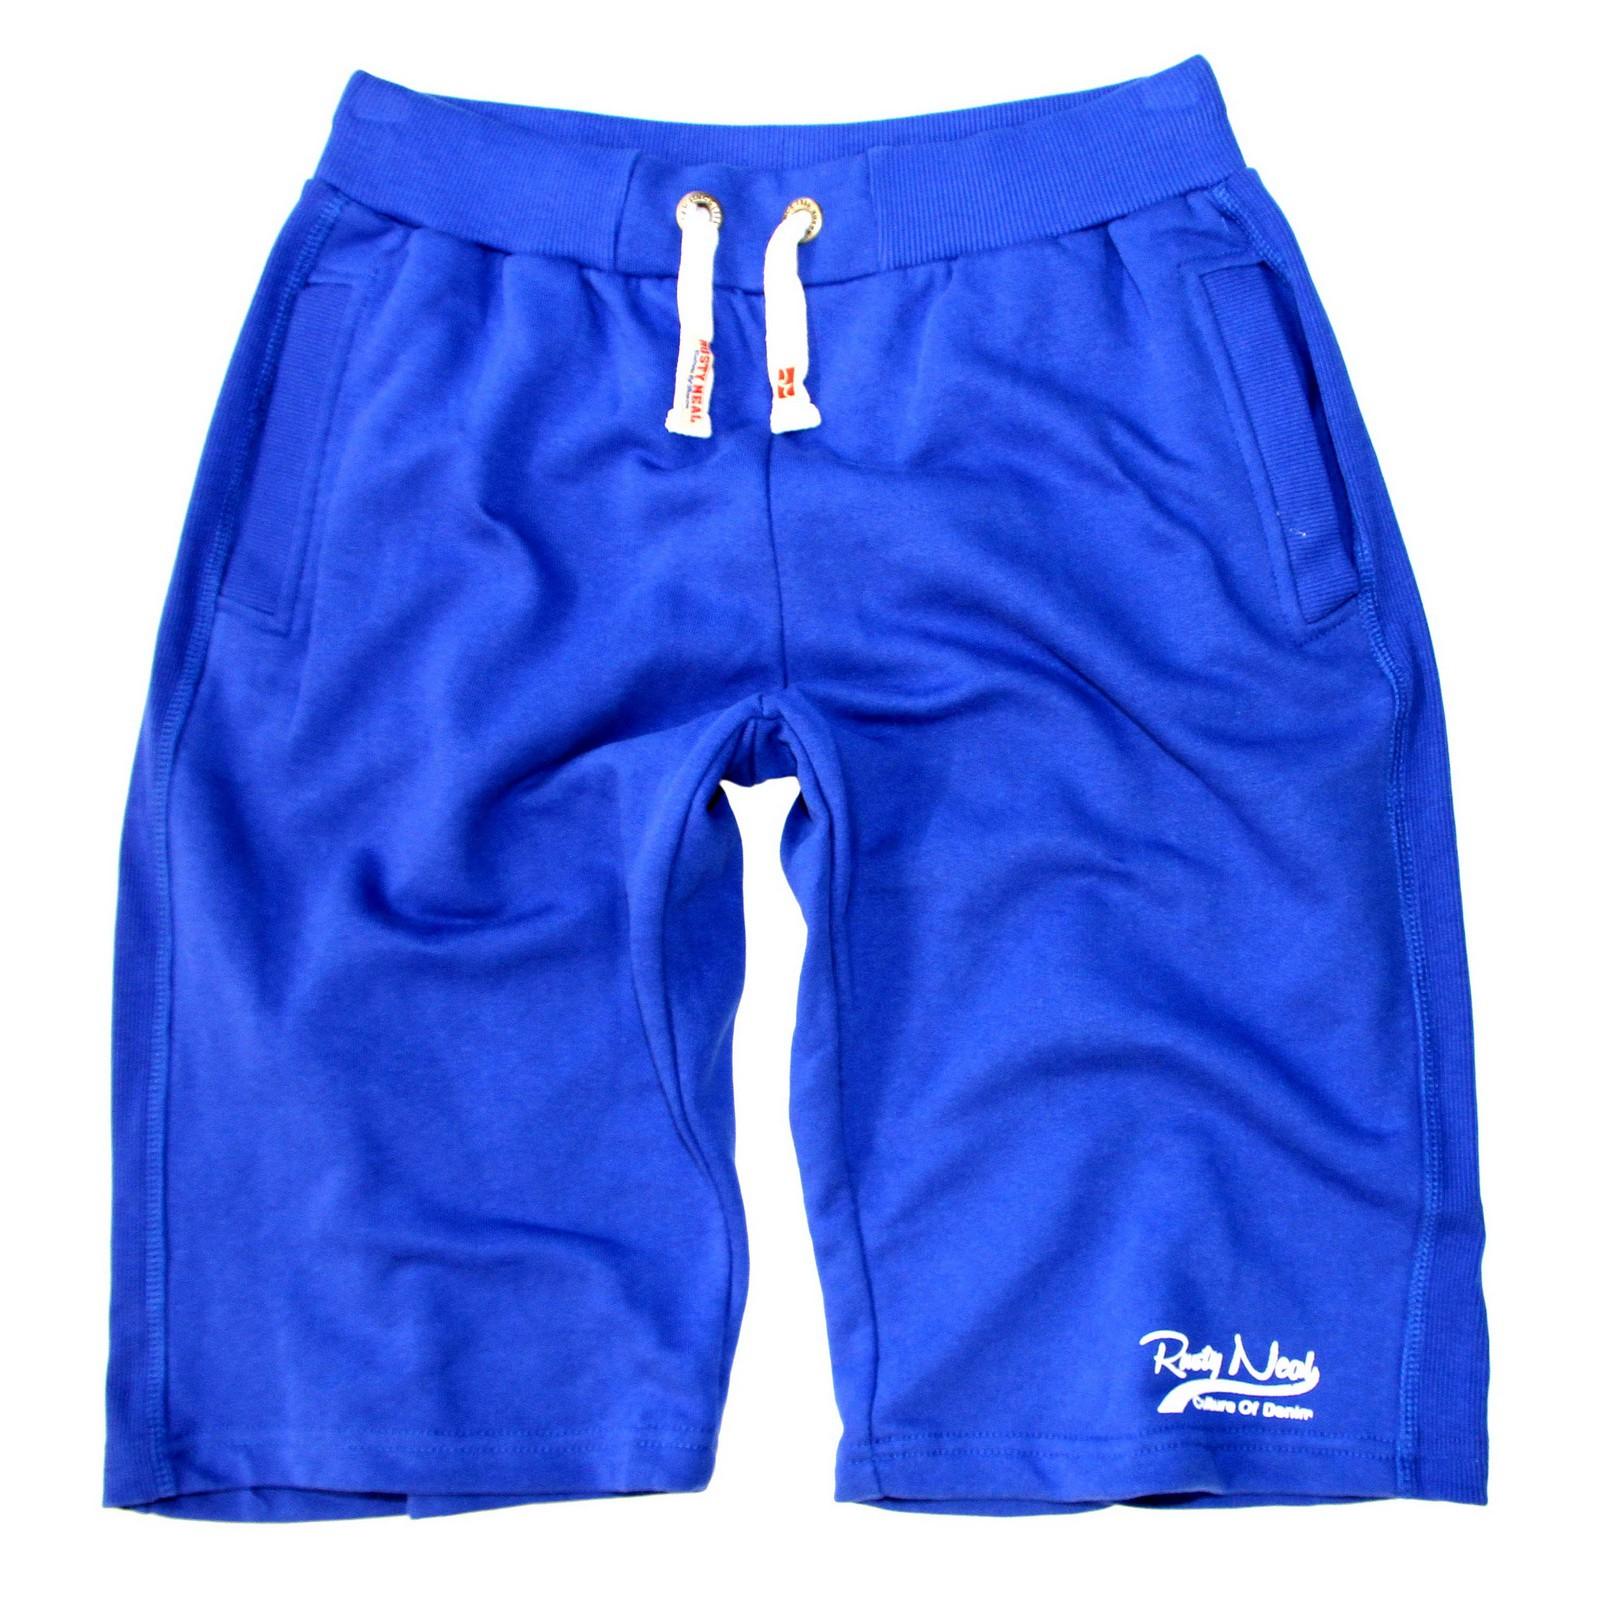 Kurze Sweat Hose Chill Pyjama 7509 R-Neal